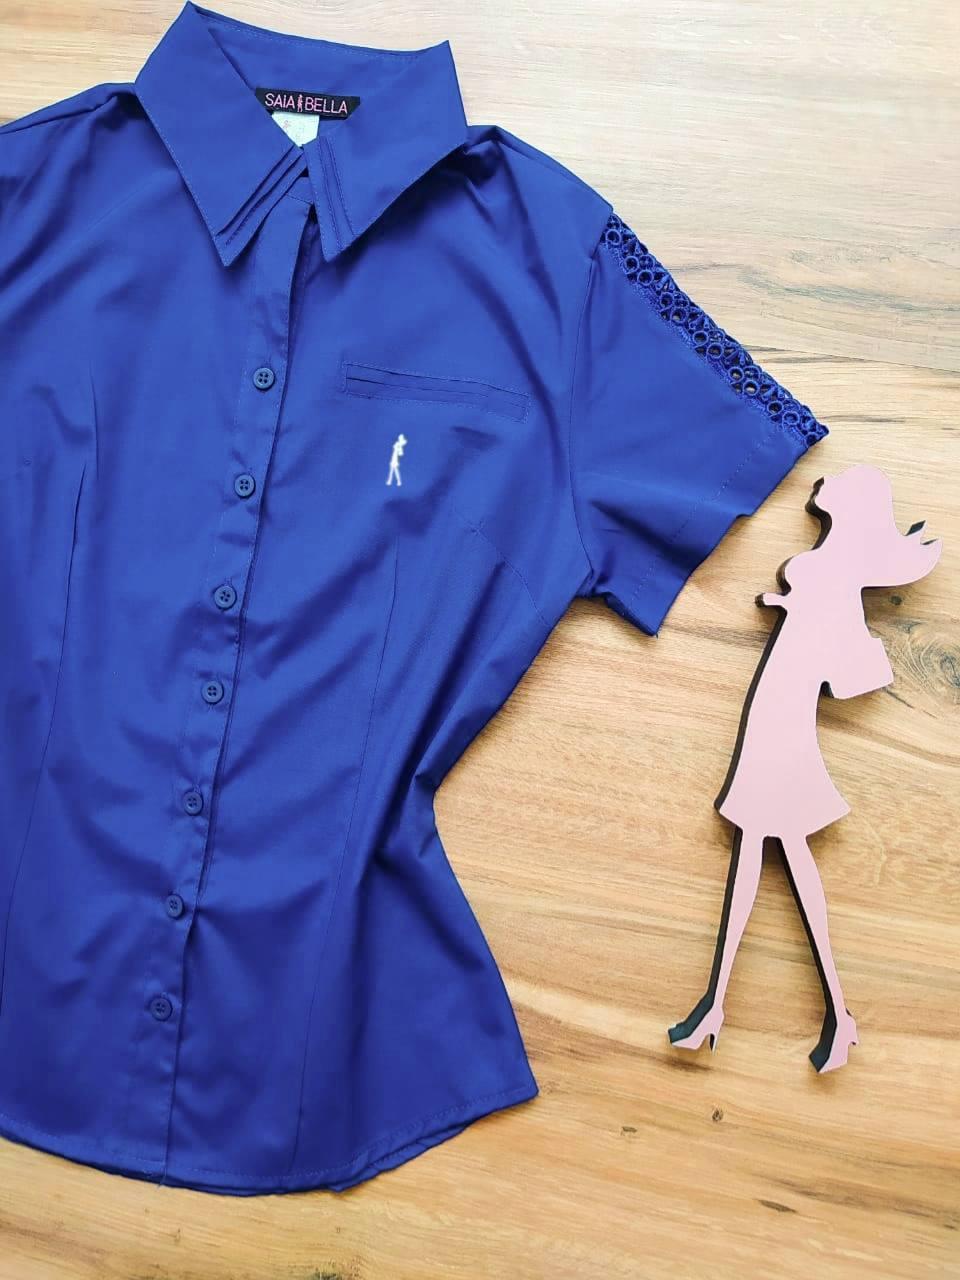 Camisa Marry Manga Curta Saia Bella SB33183 Azul Royal